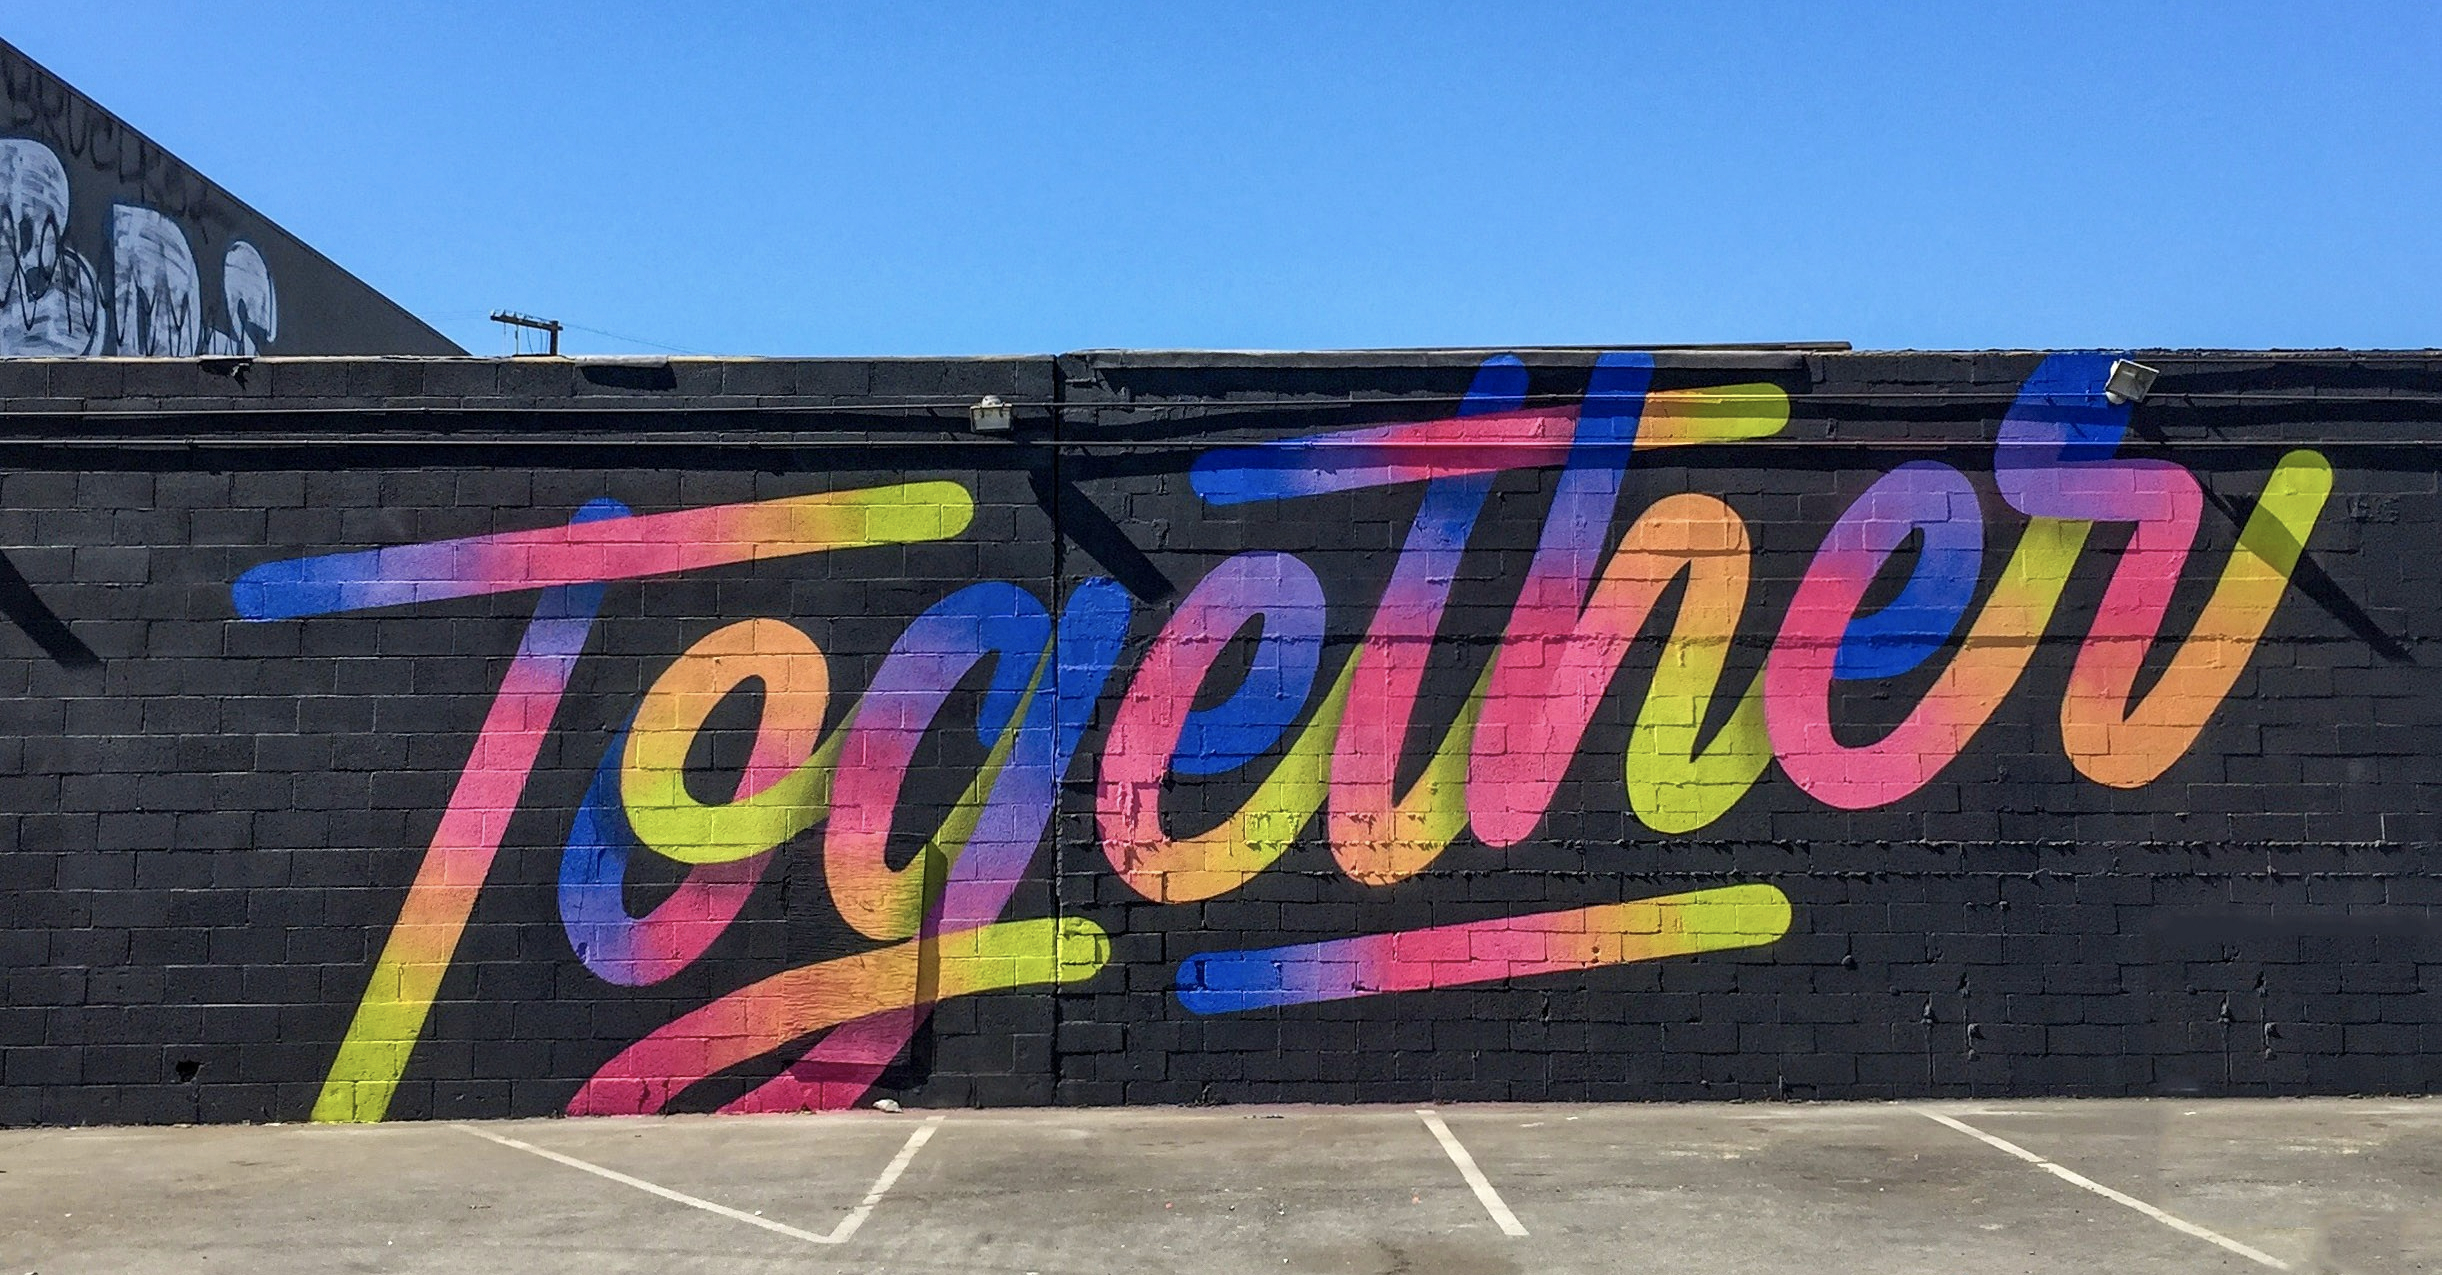 Sayings of street artists